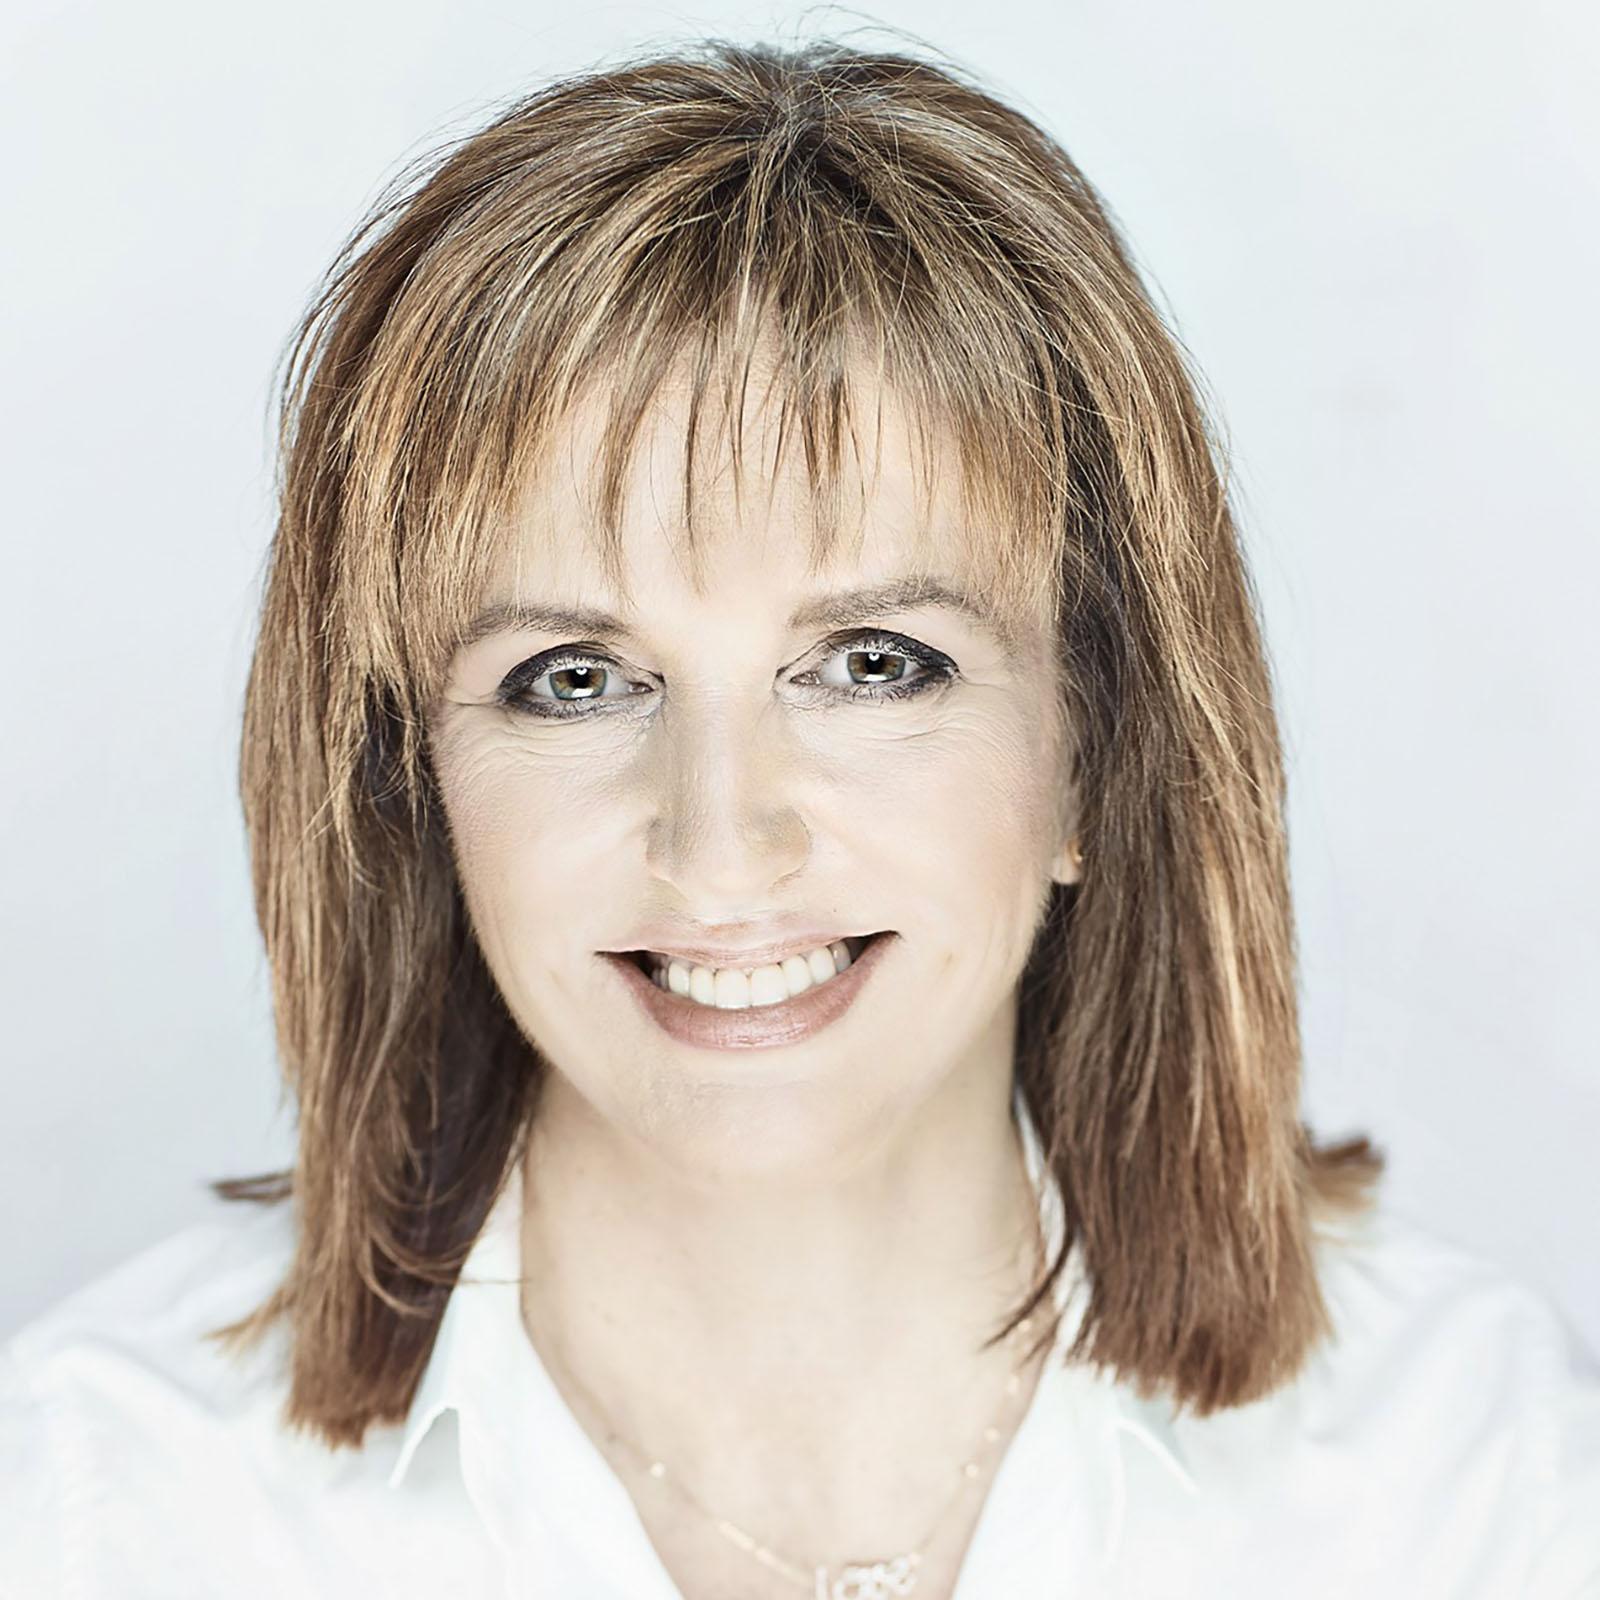 Karin Gornik